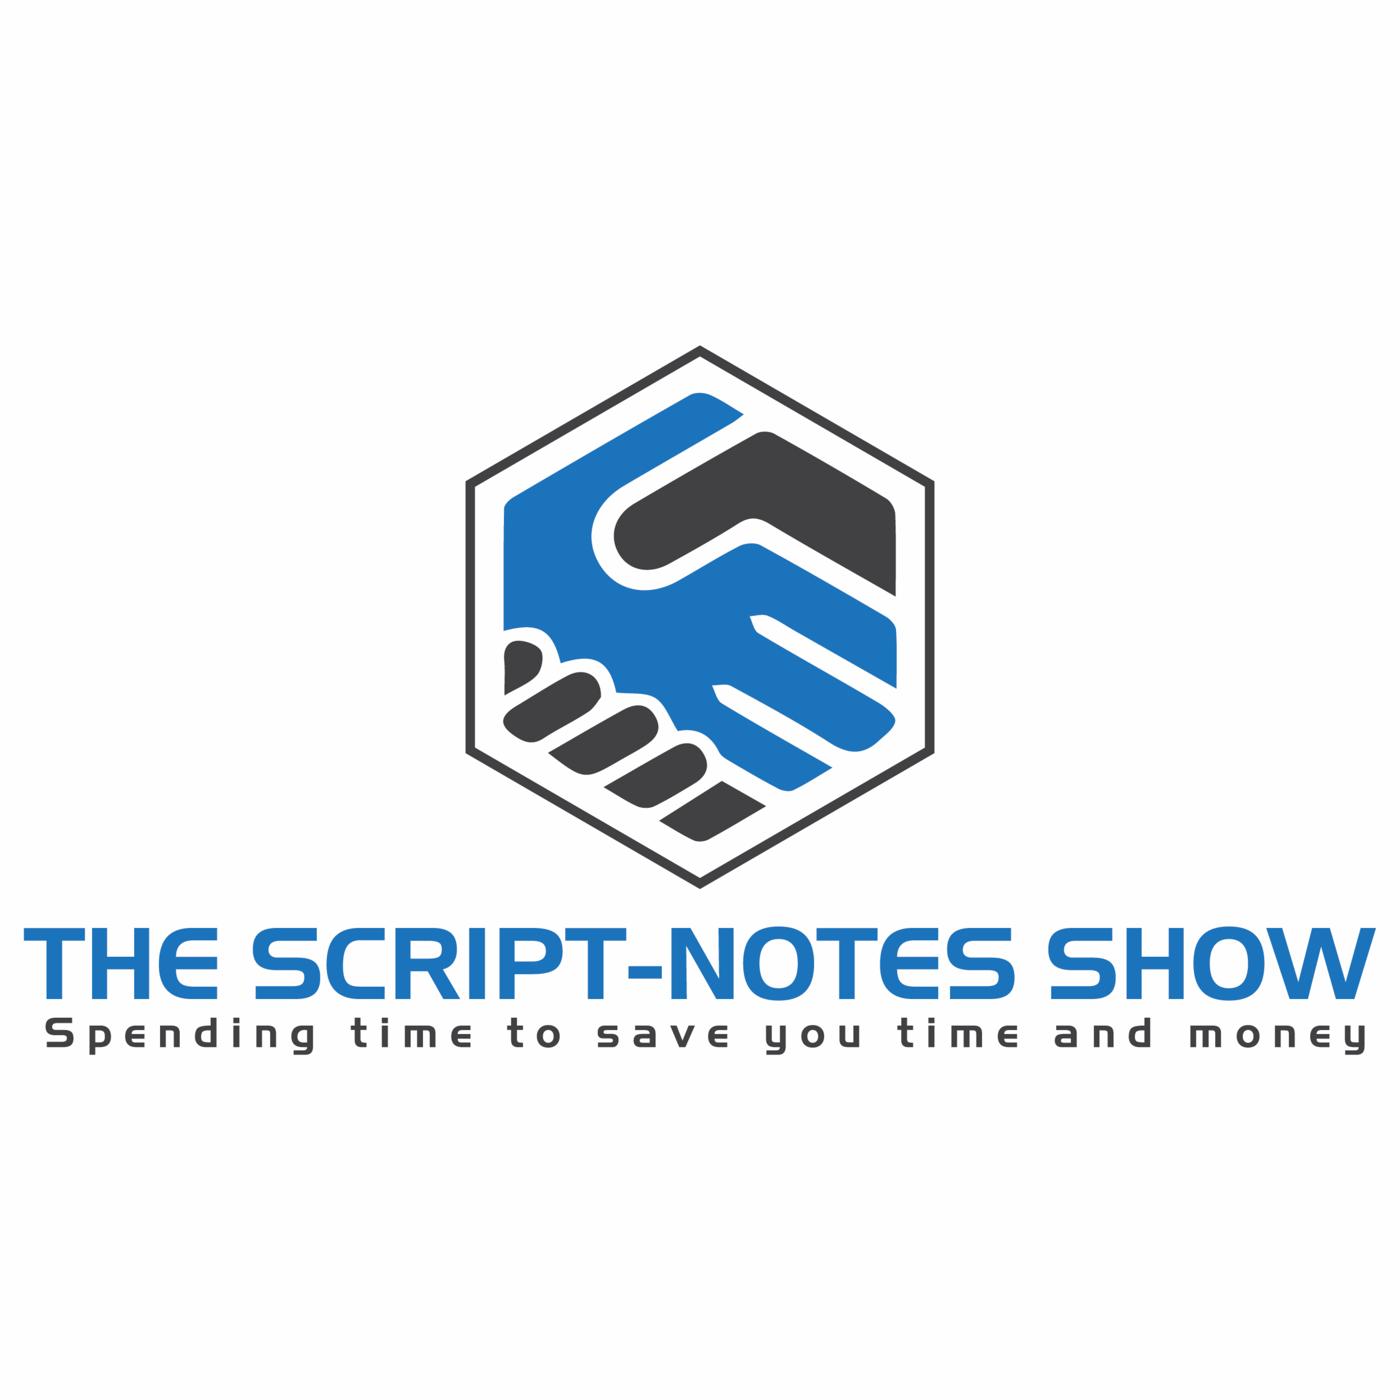 The Script-Notes Show album art